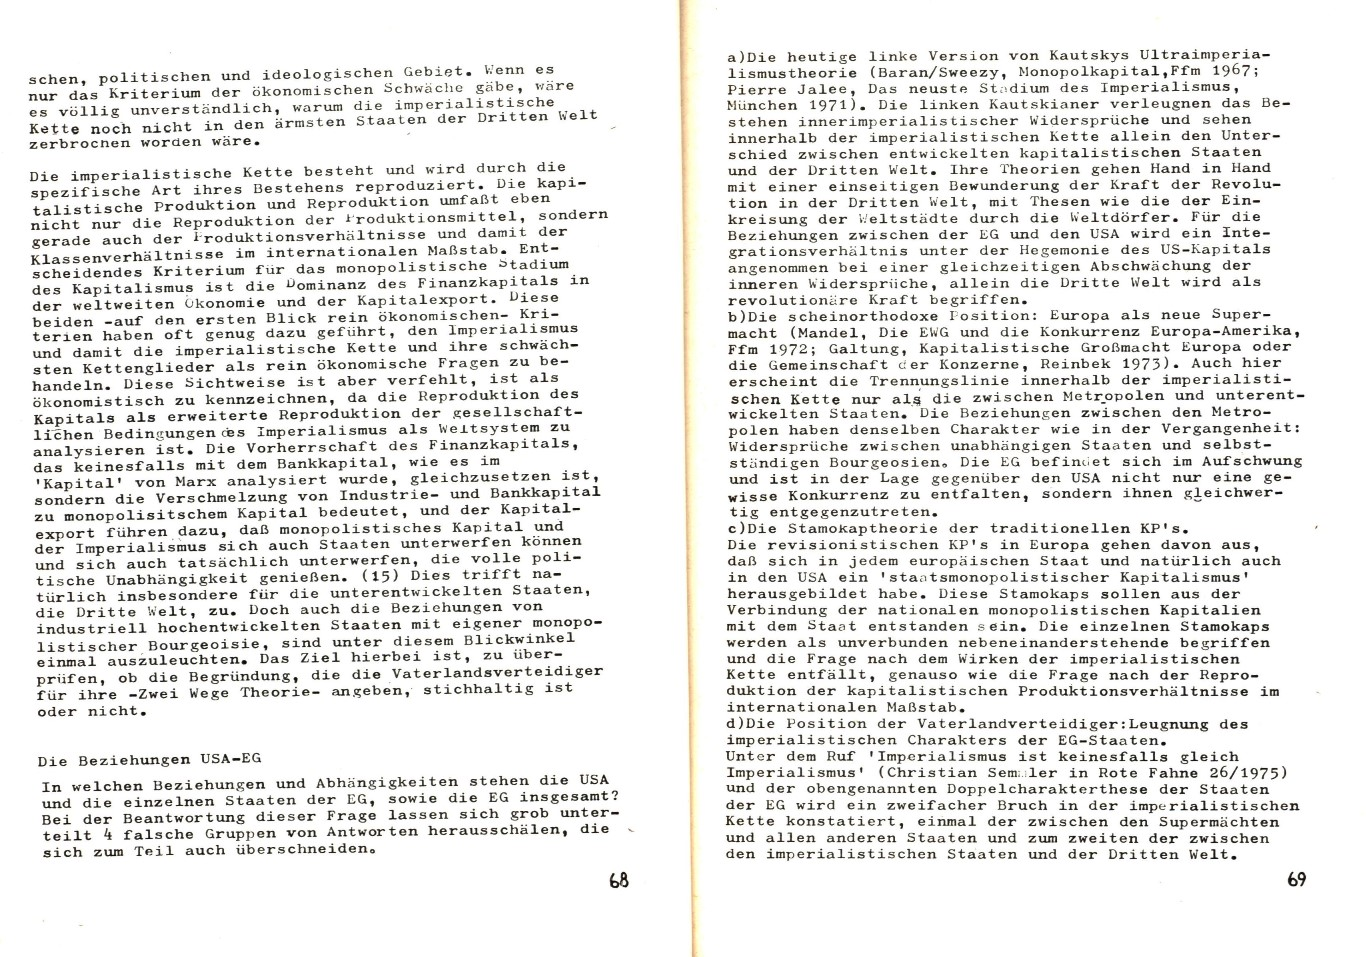 Berlin_KSV_1975_Dokumente_der_SAZ_36